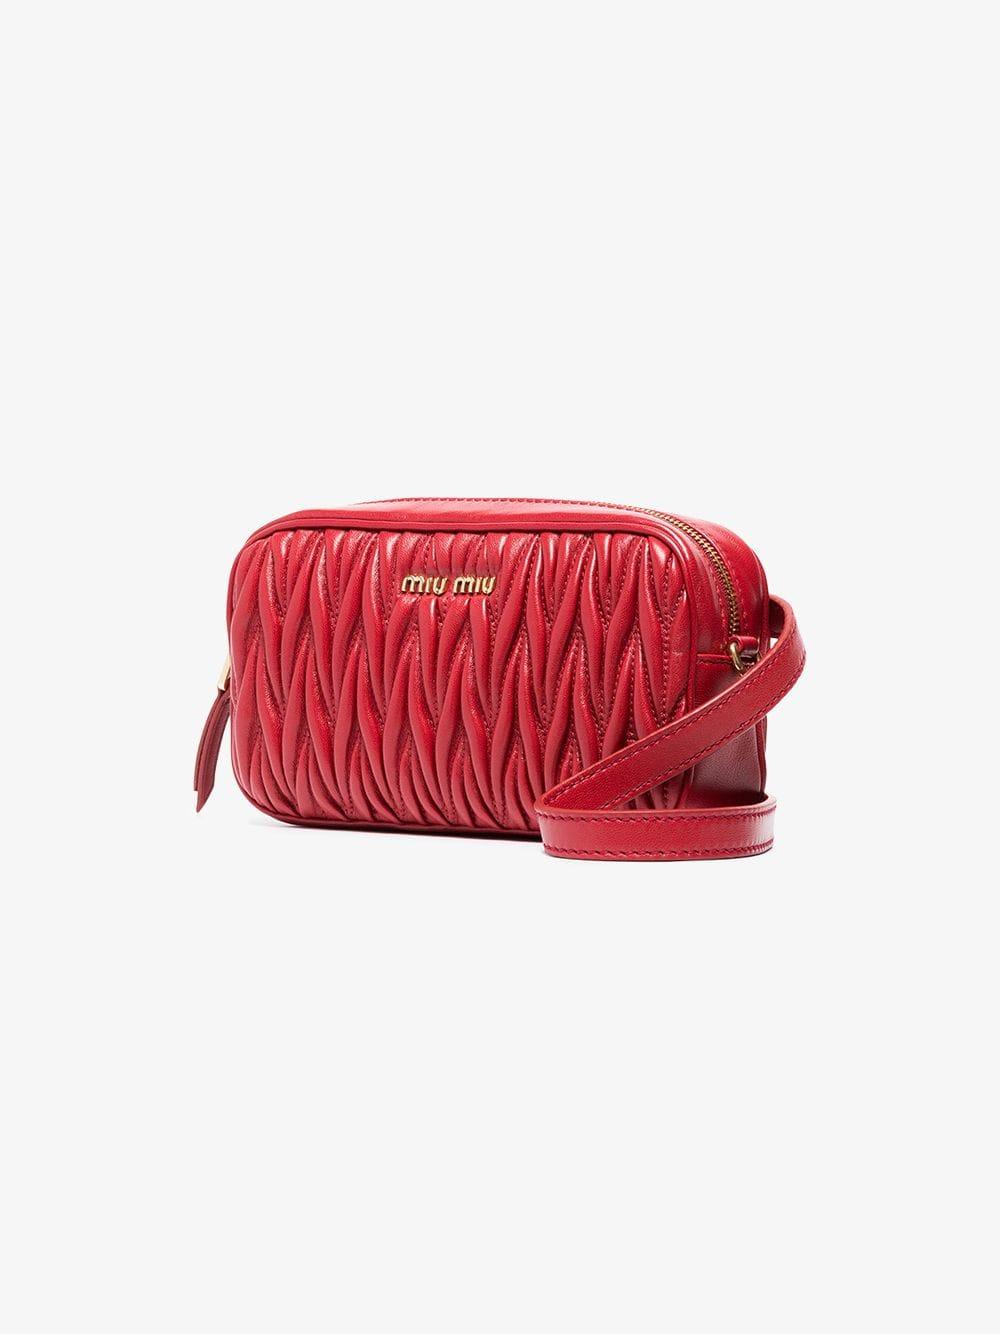 adf69129d51 Miu Miu - Red Matelassé Leather Belt Bag - Lyst. View fullscreen